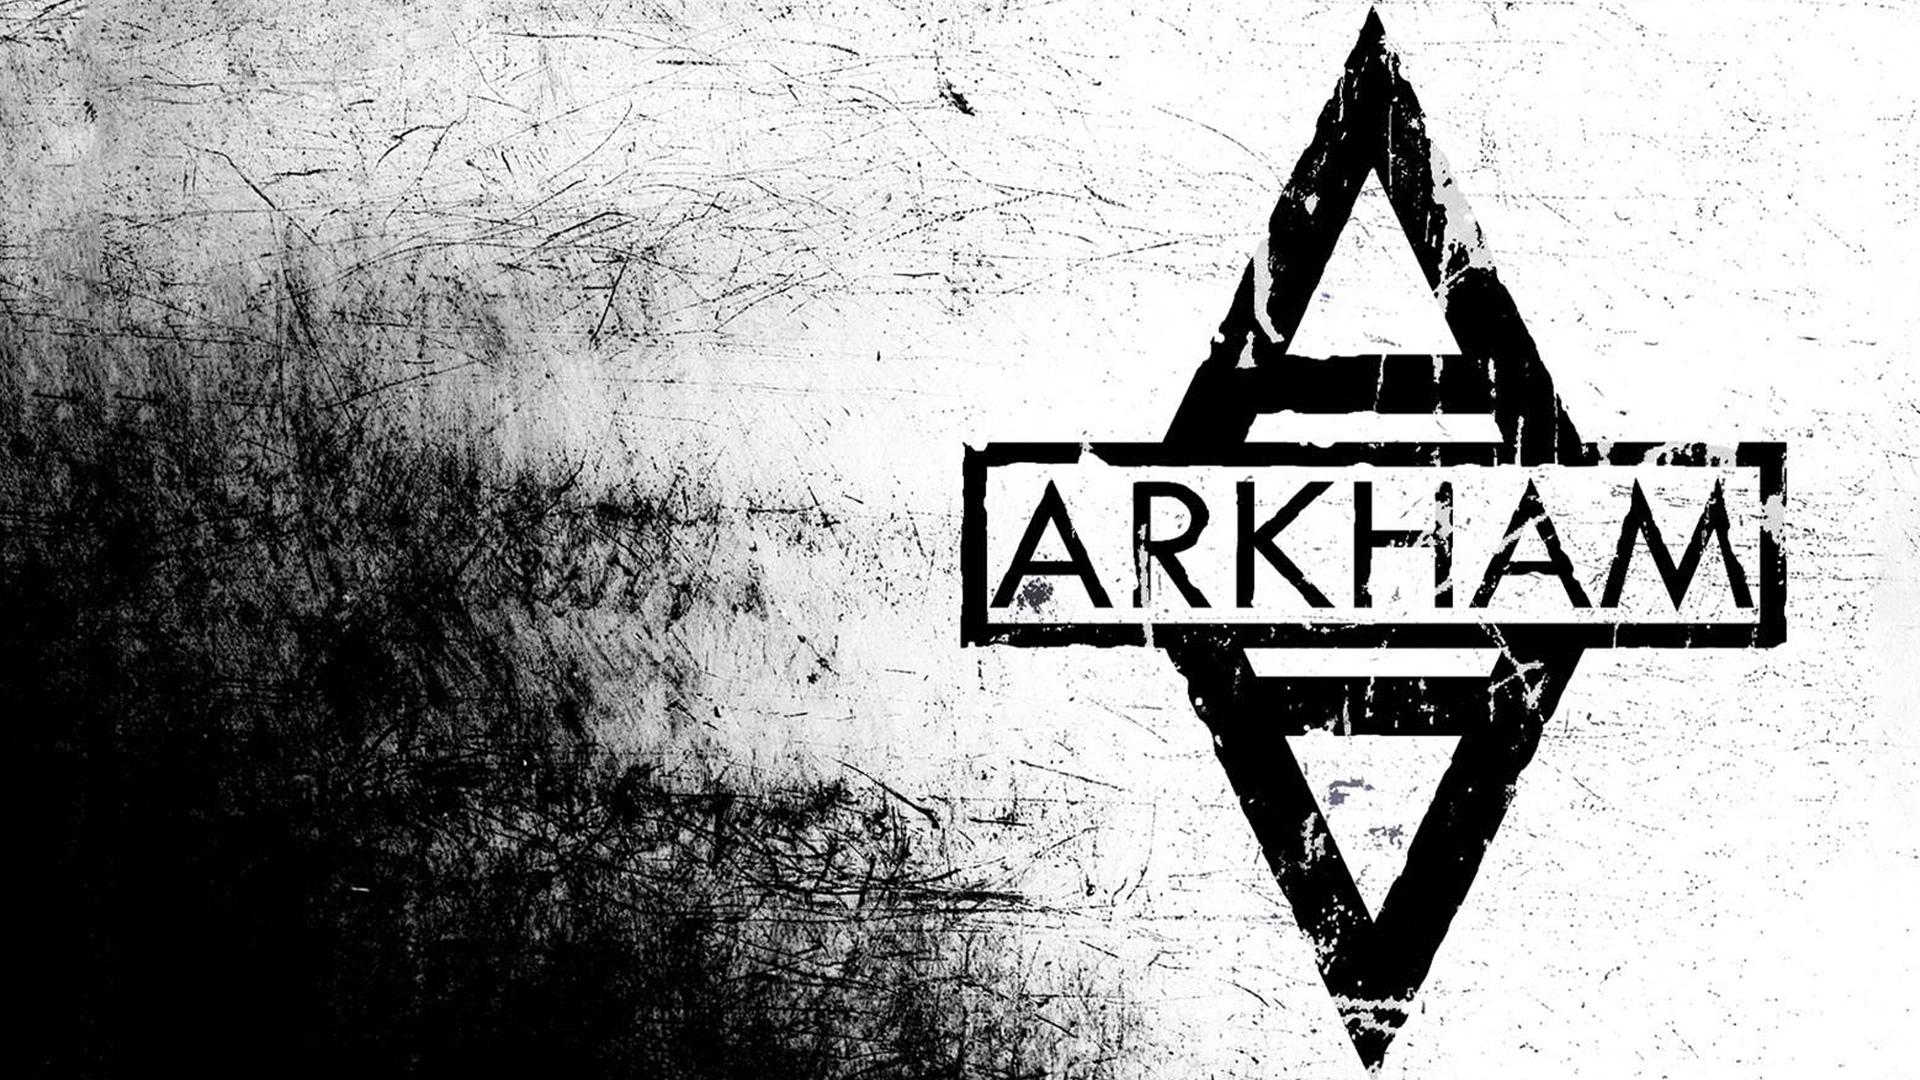 arkham symbol wallpaper - photo #1